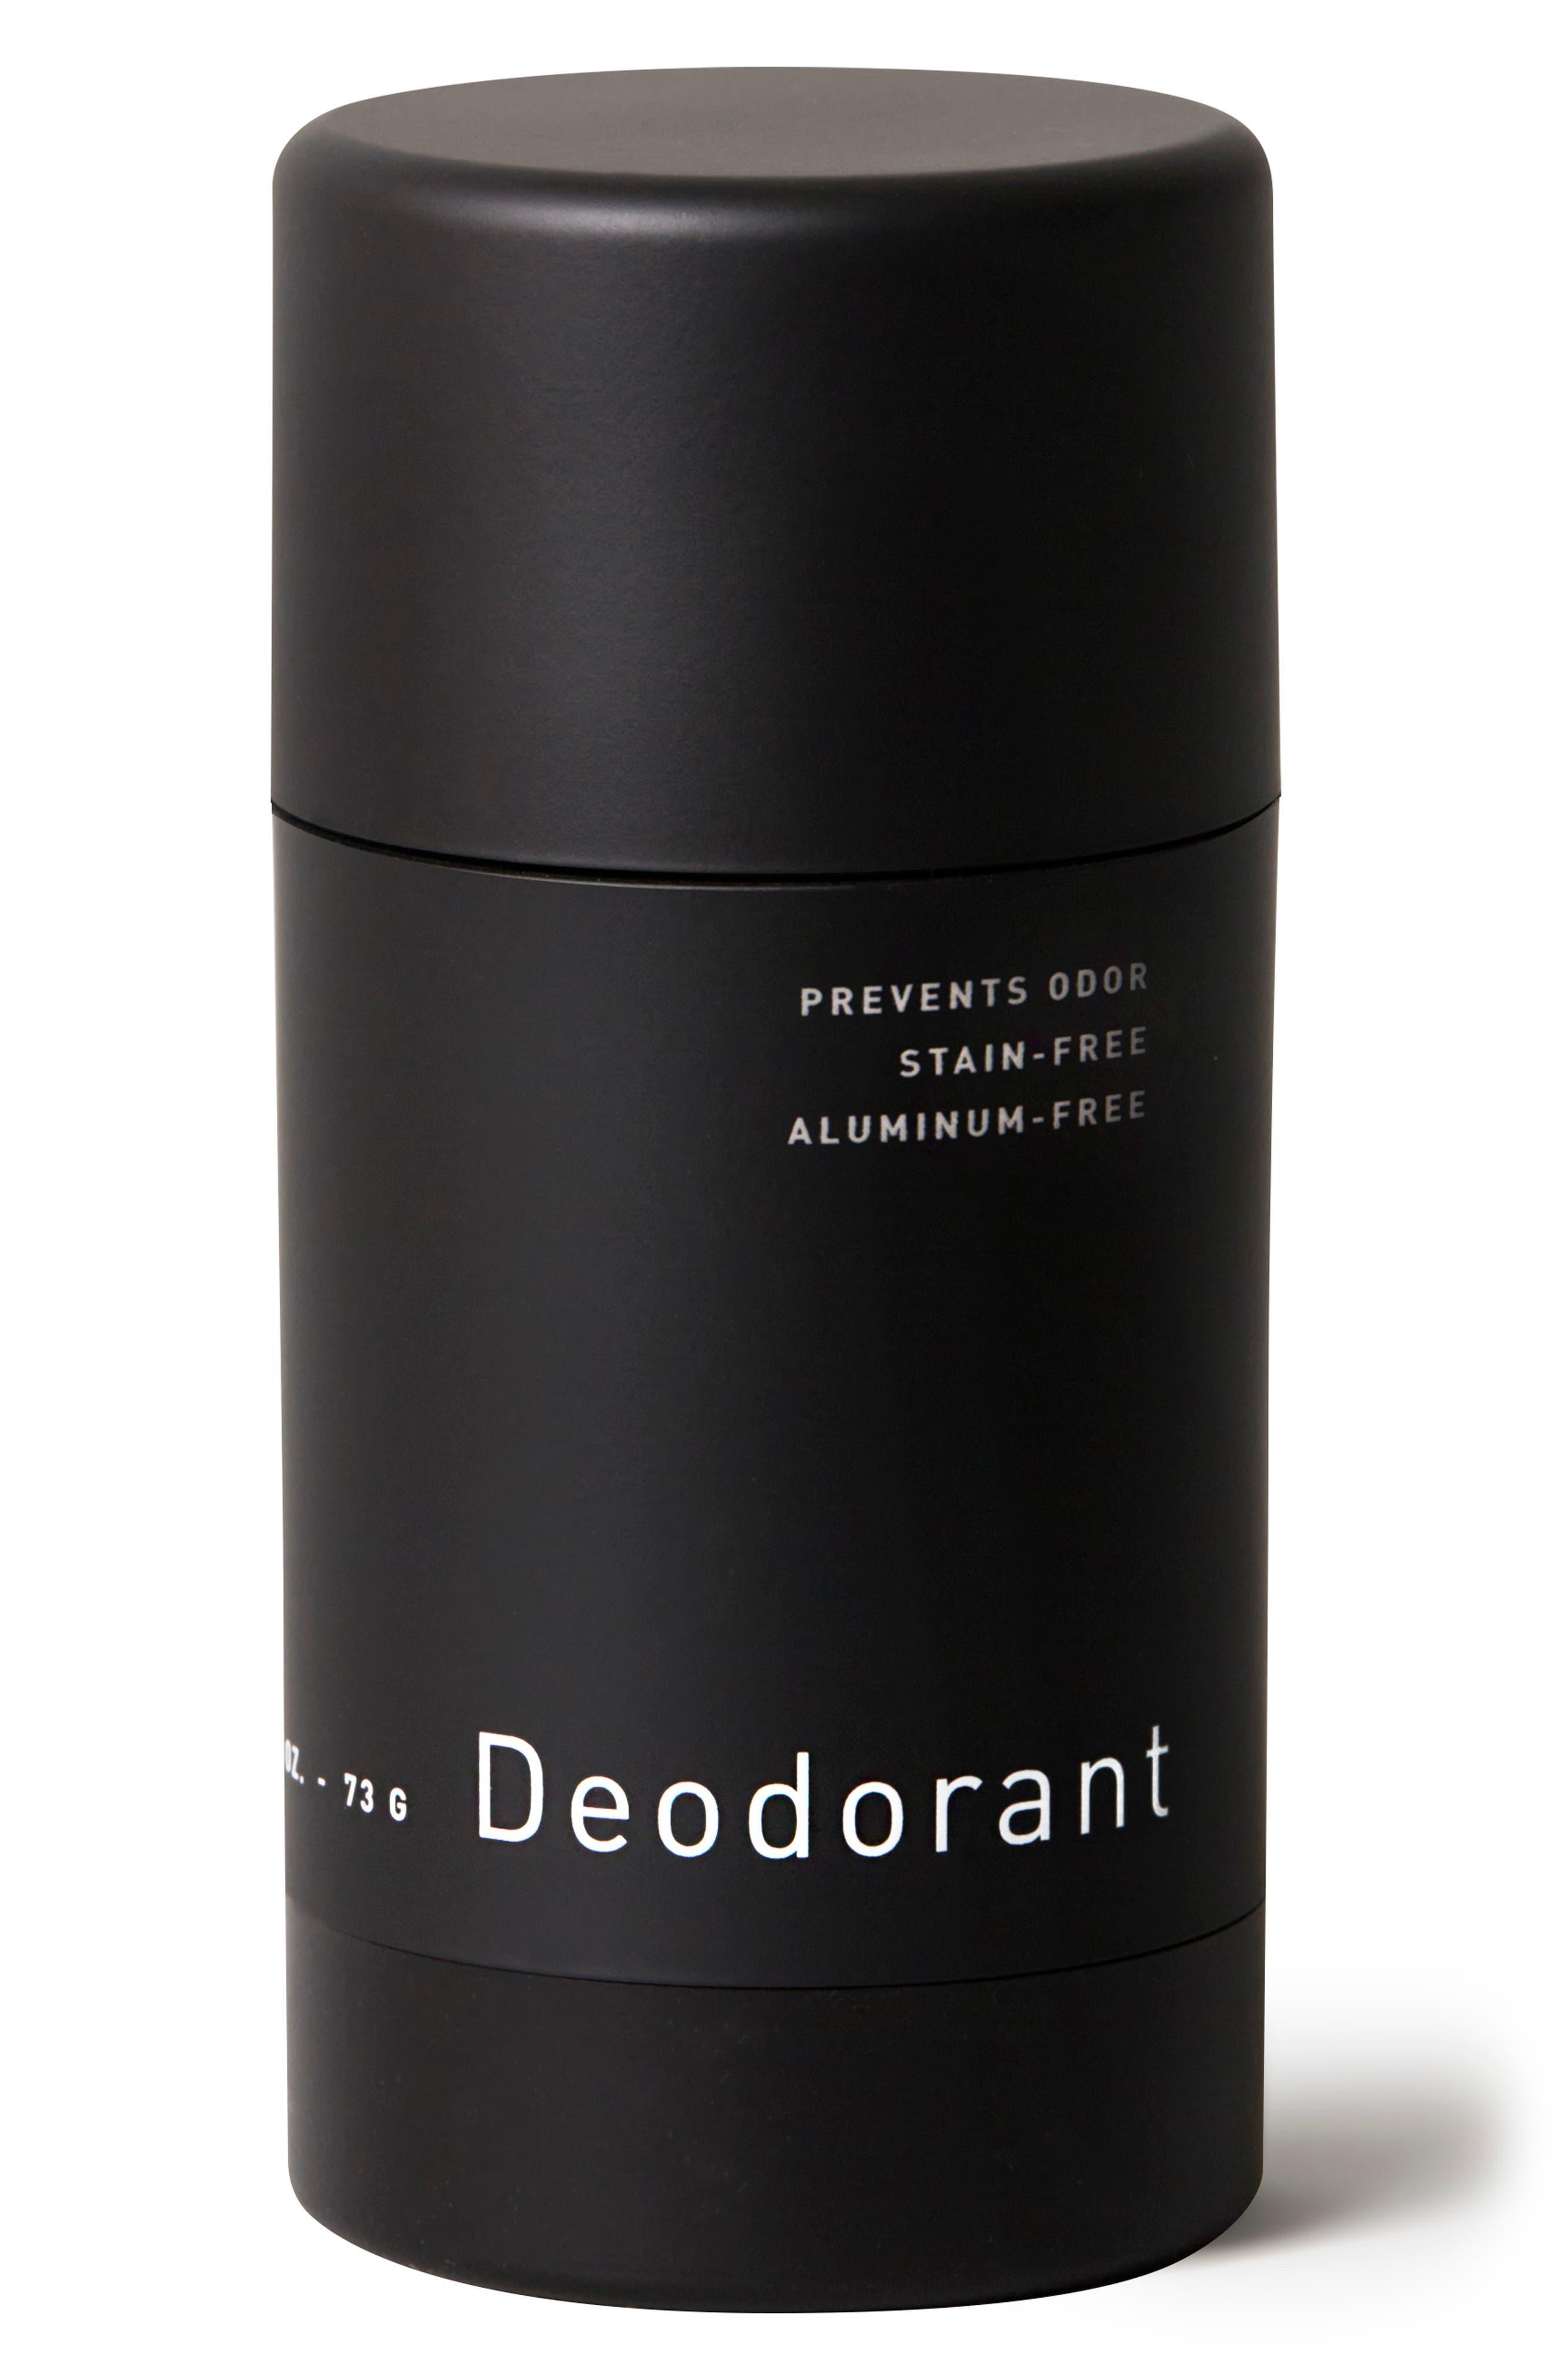 Stain-Free Deodorant